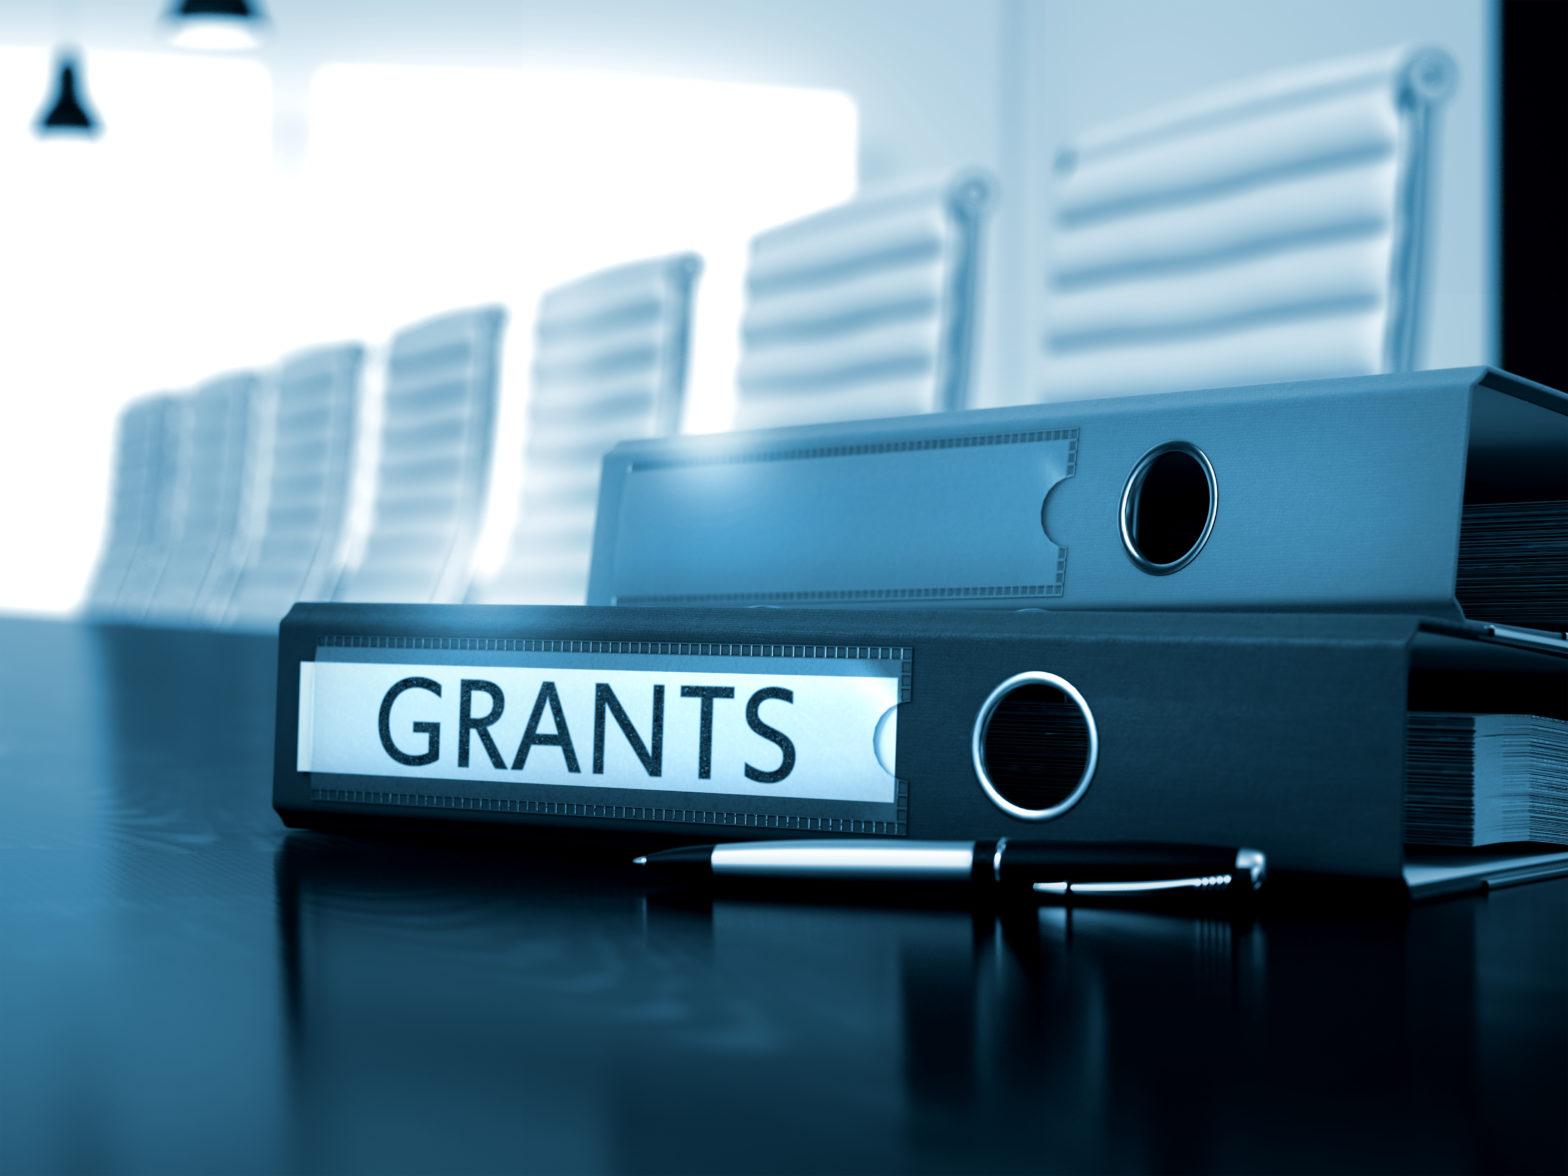 Grants, charity, nonprofit